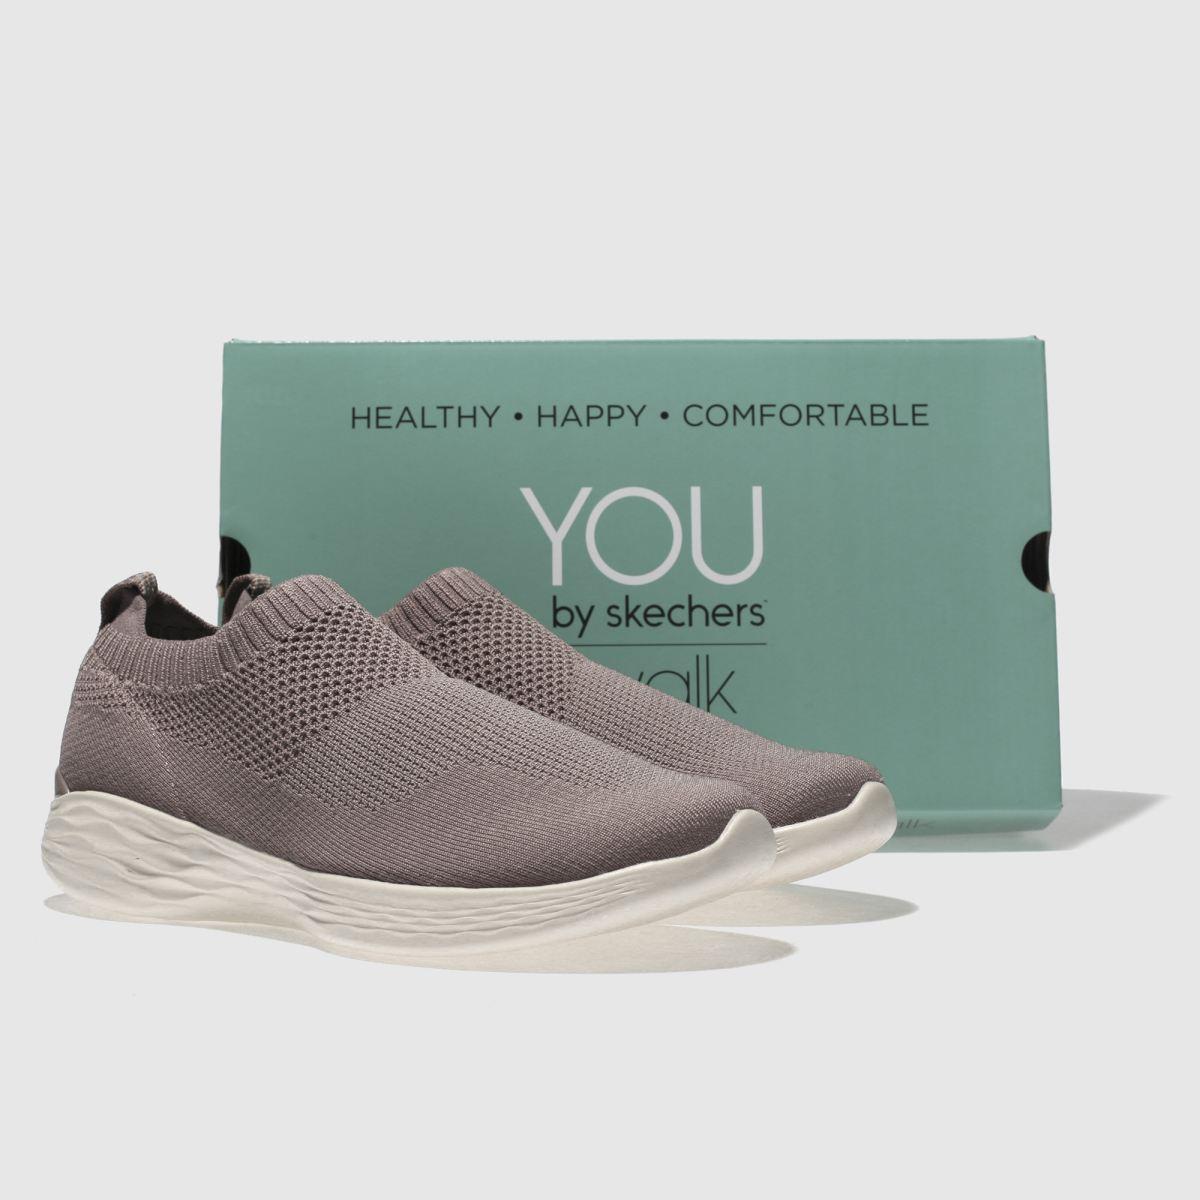 Damen Malve skechers You Gute Pure Sneaker | schuh Gute You Qualität beliebte Schuhe 5ec774